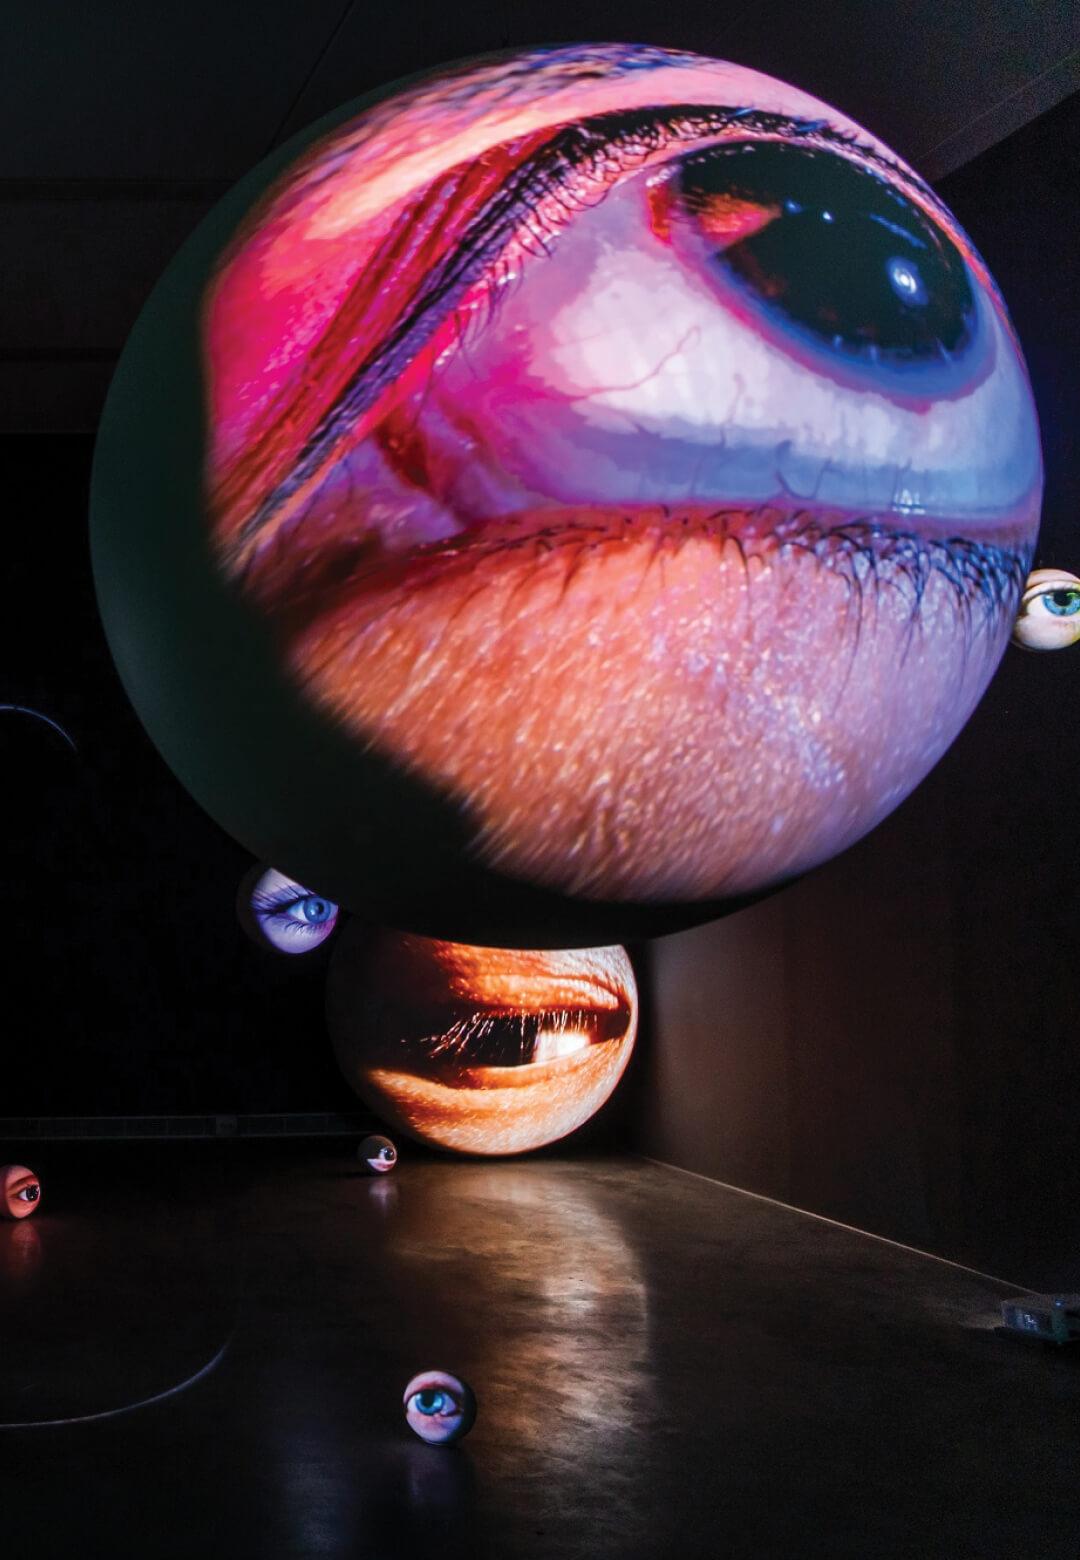 'Black Box' at Kaohsiung Museum, Taiwan | Tony Oursler: Black Box | Tony Oursler | STIRworld